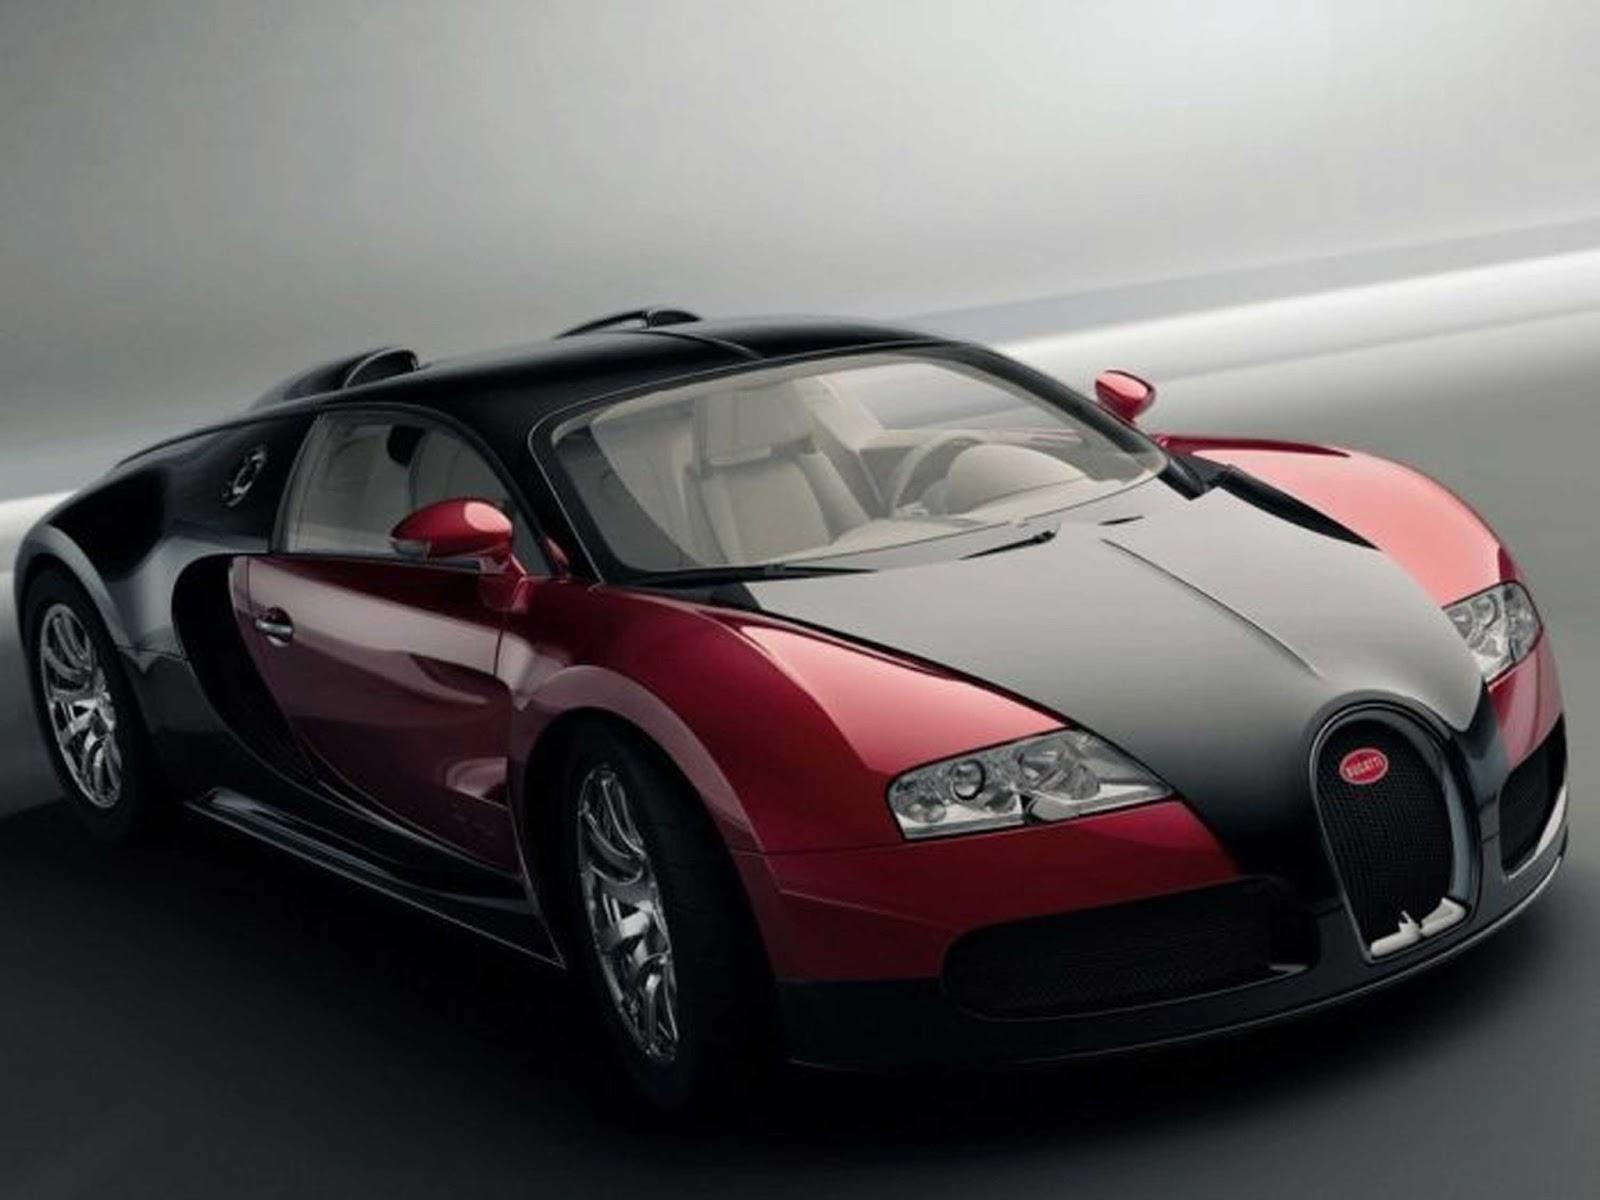 b+v Extraordinary Bugatti Veyron Price List Philippines Cars Trend